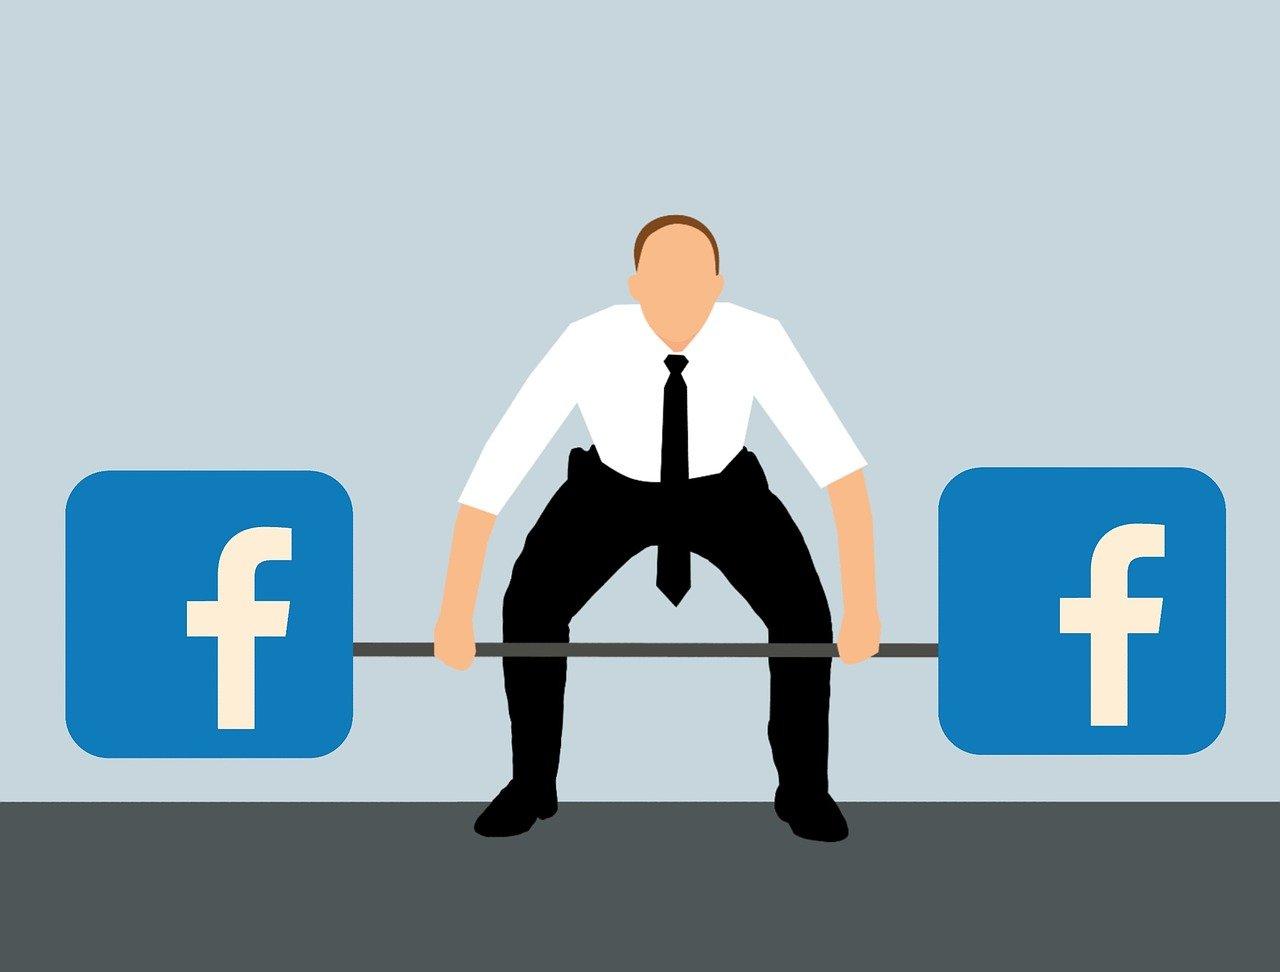 Facebook廣告懶人包:認識臉書廣告費用、競價與設定方式 - 廣告阿倫|網路行銷加速器